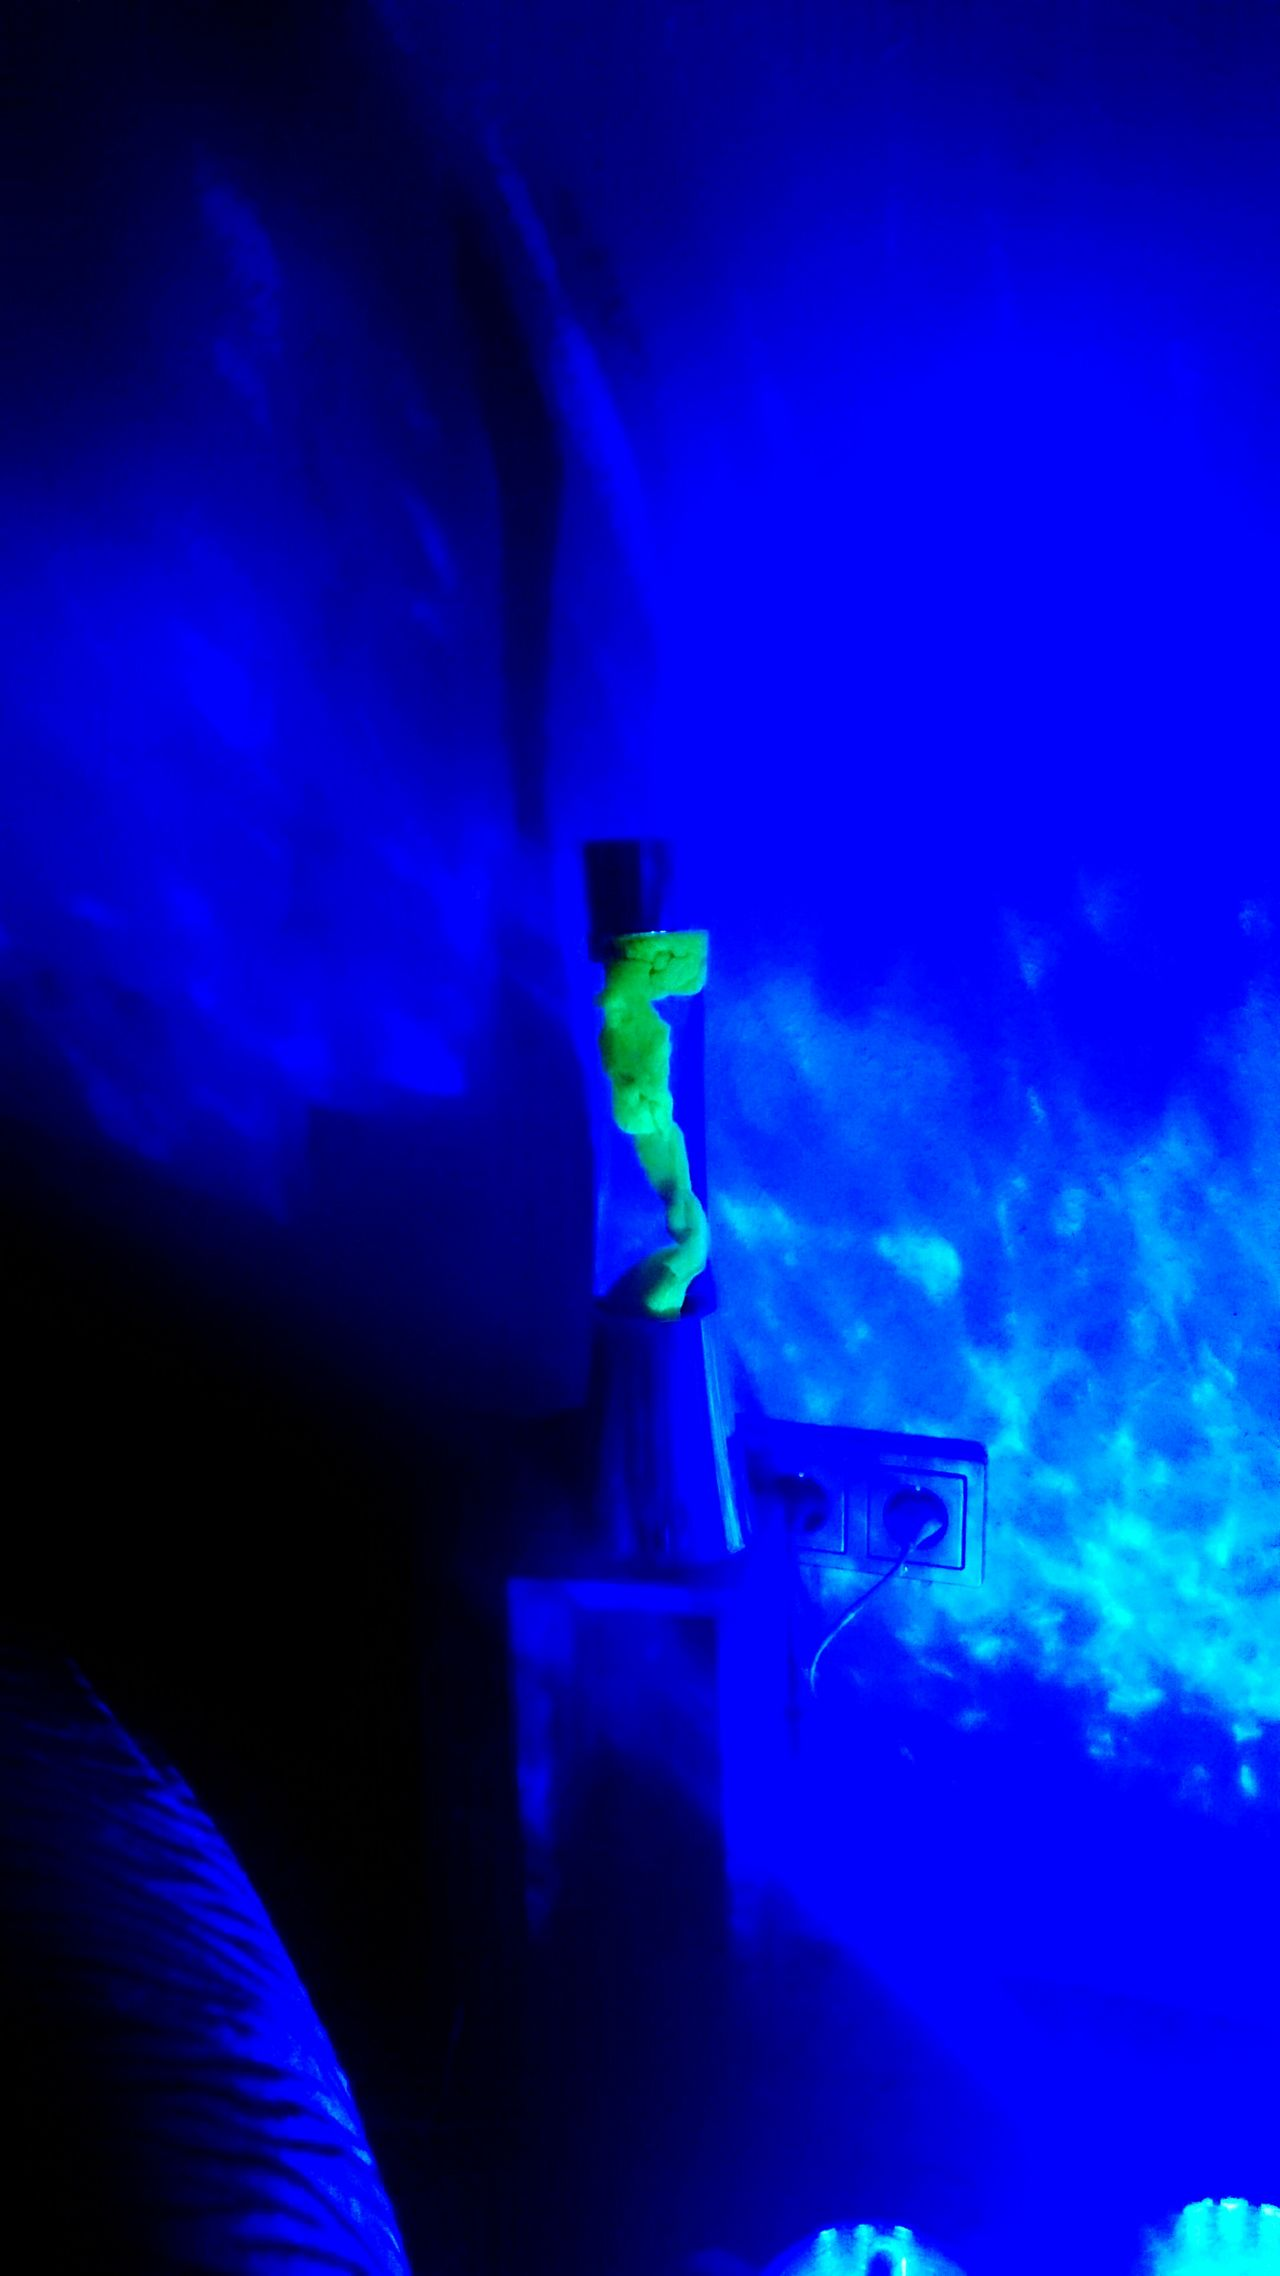 Lava lamp overnight - Overnight Success Lava Lamp In Blue Light Neon Yellow Blue Technology Atmospheric Mood Vibrant